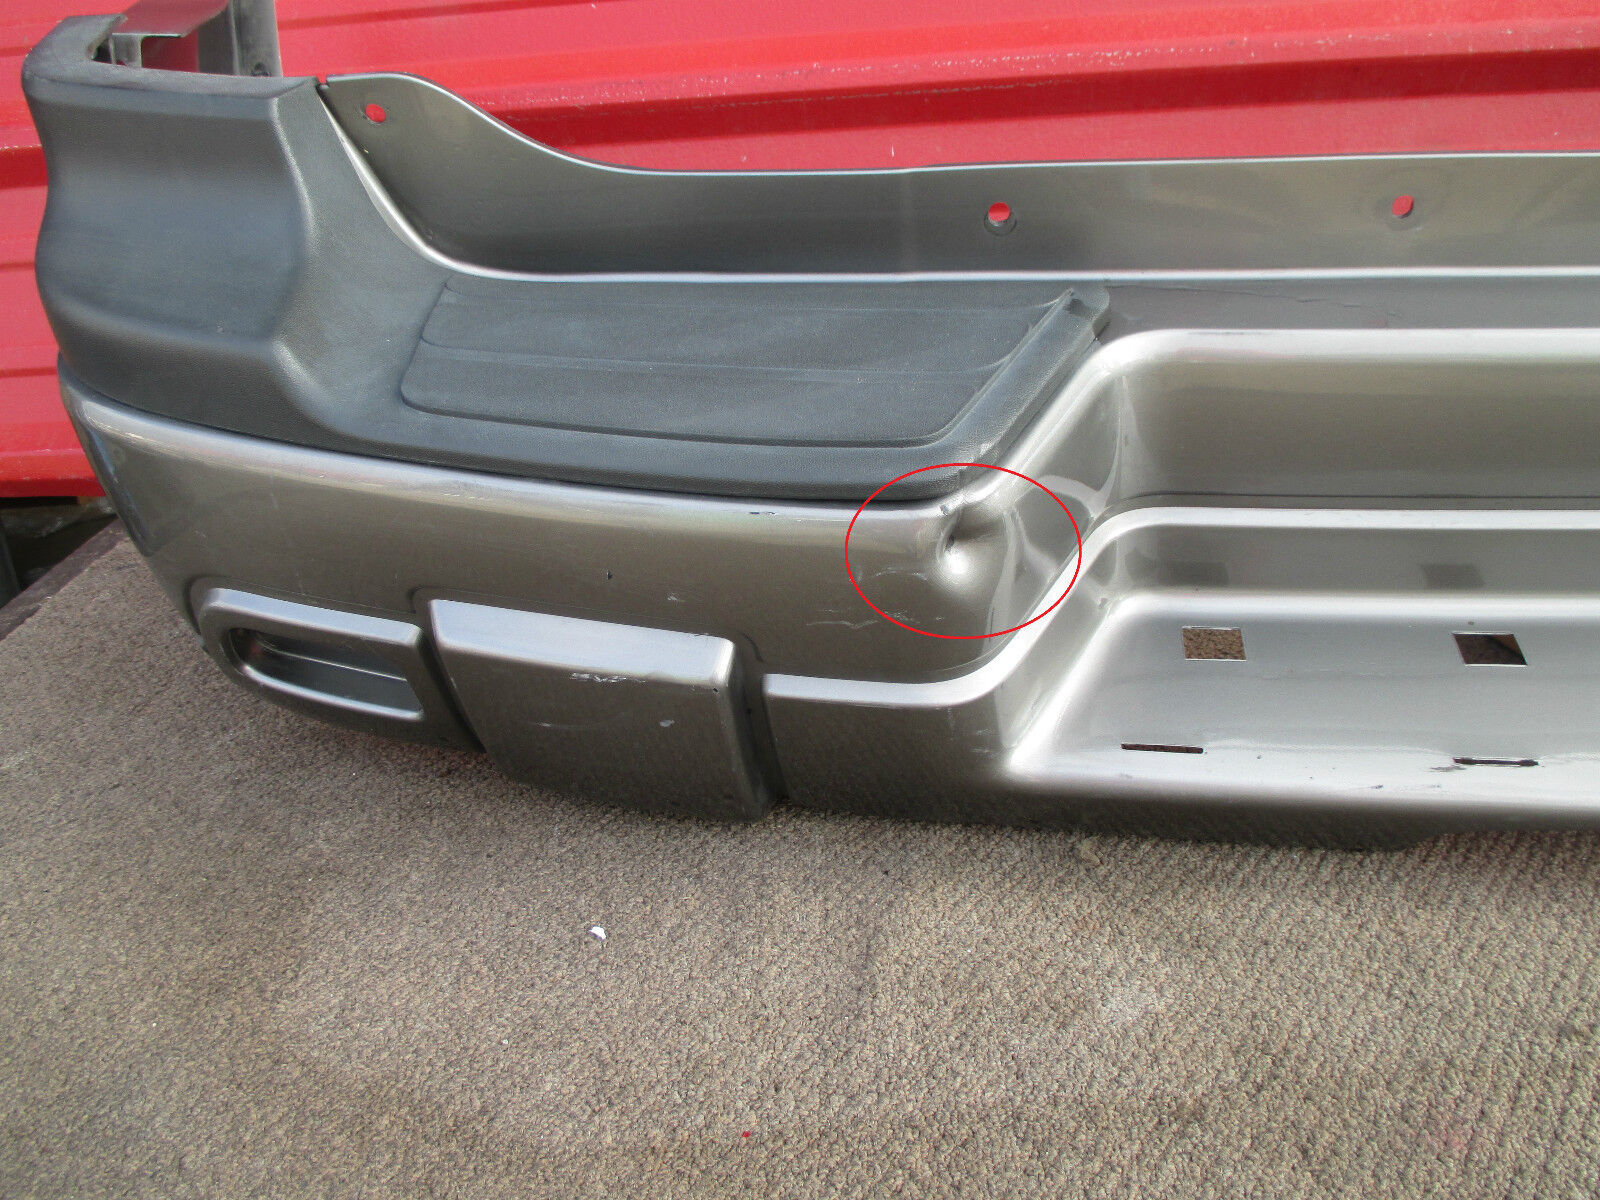 hight resolution of 2008 chevrolet trailblazer oem rear bumper cover 02 03 04 05 06 07 for sale